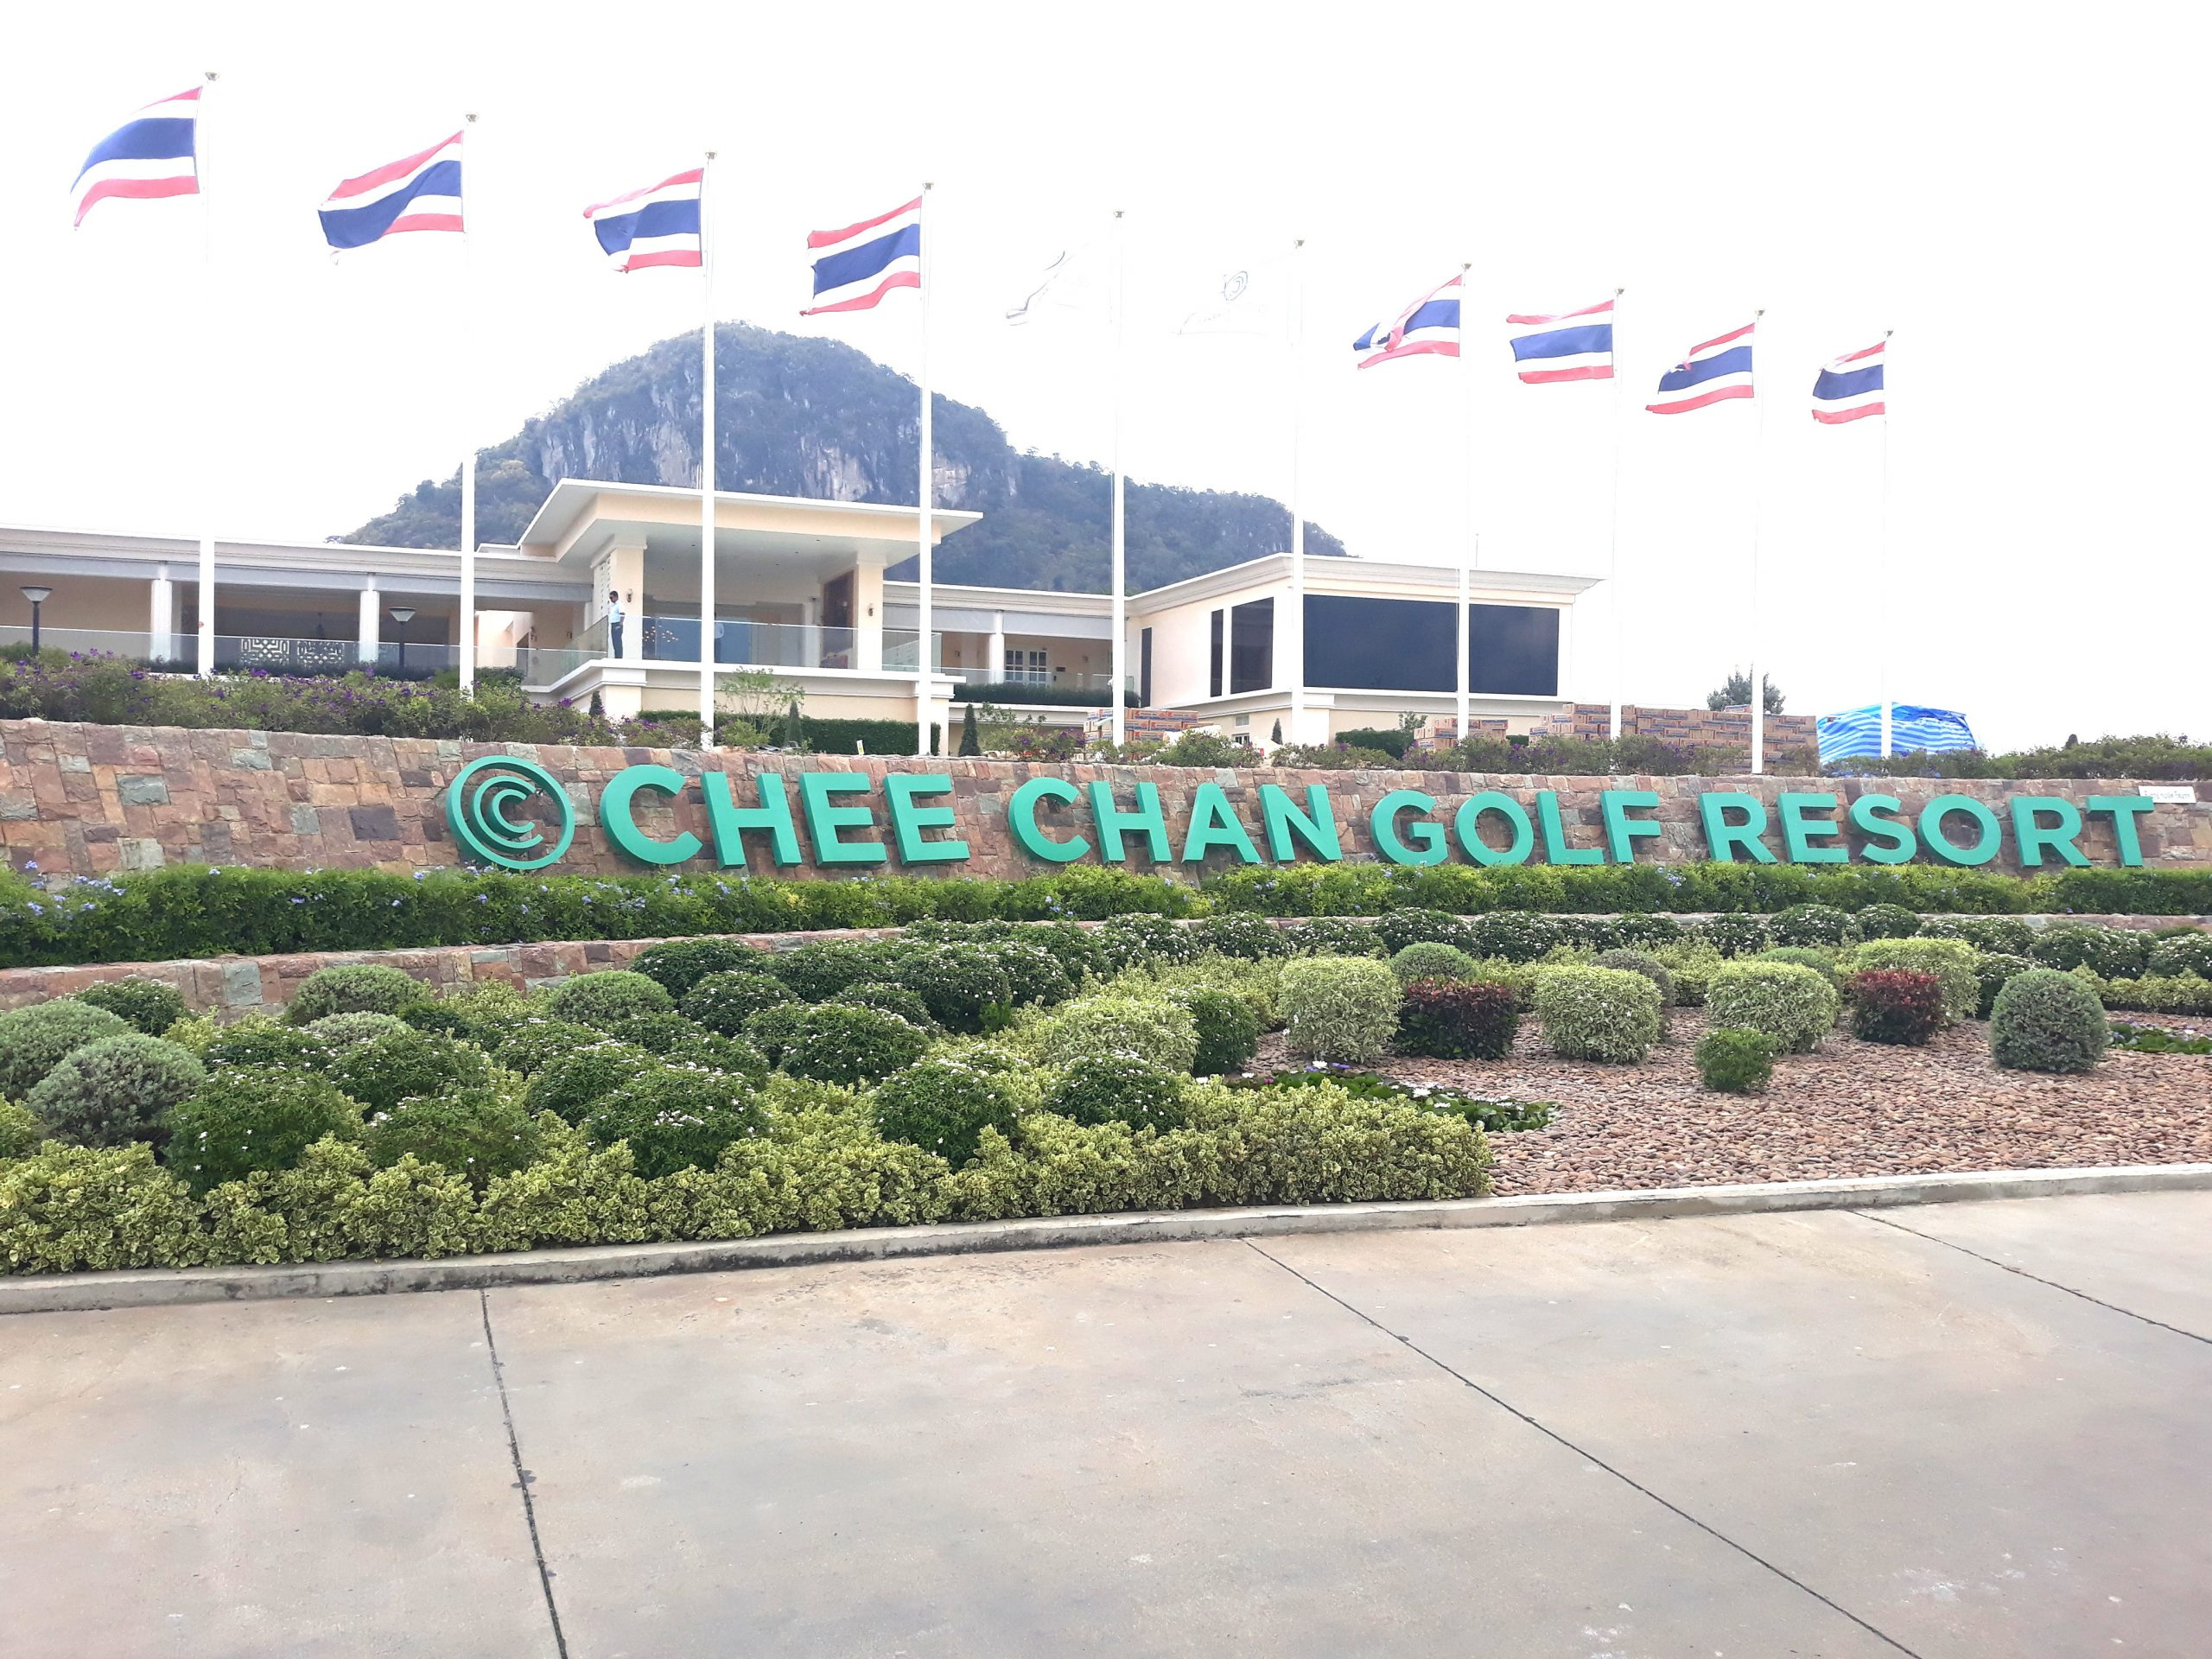 Chee Chan